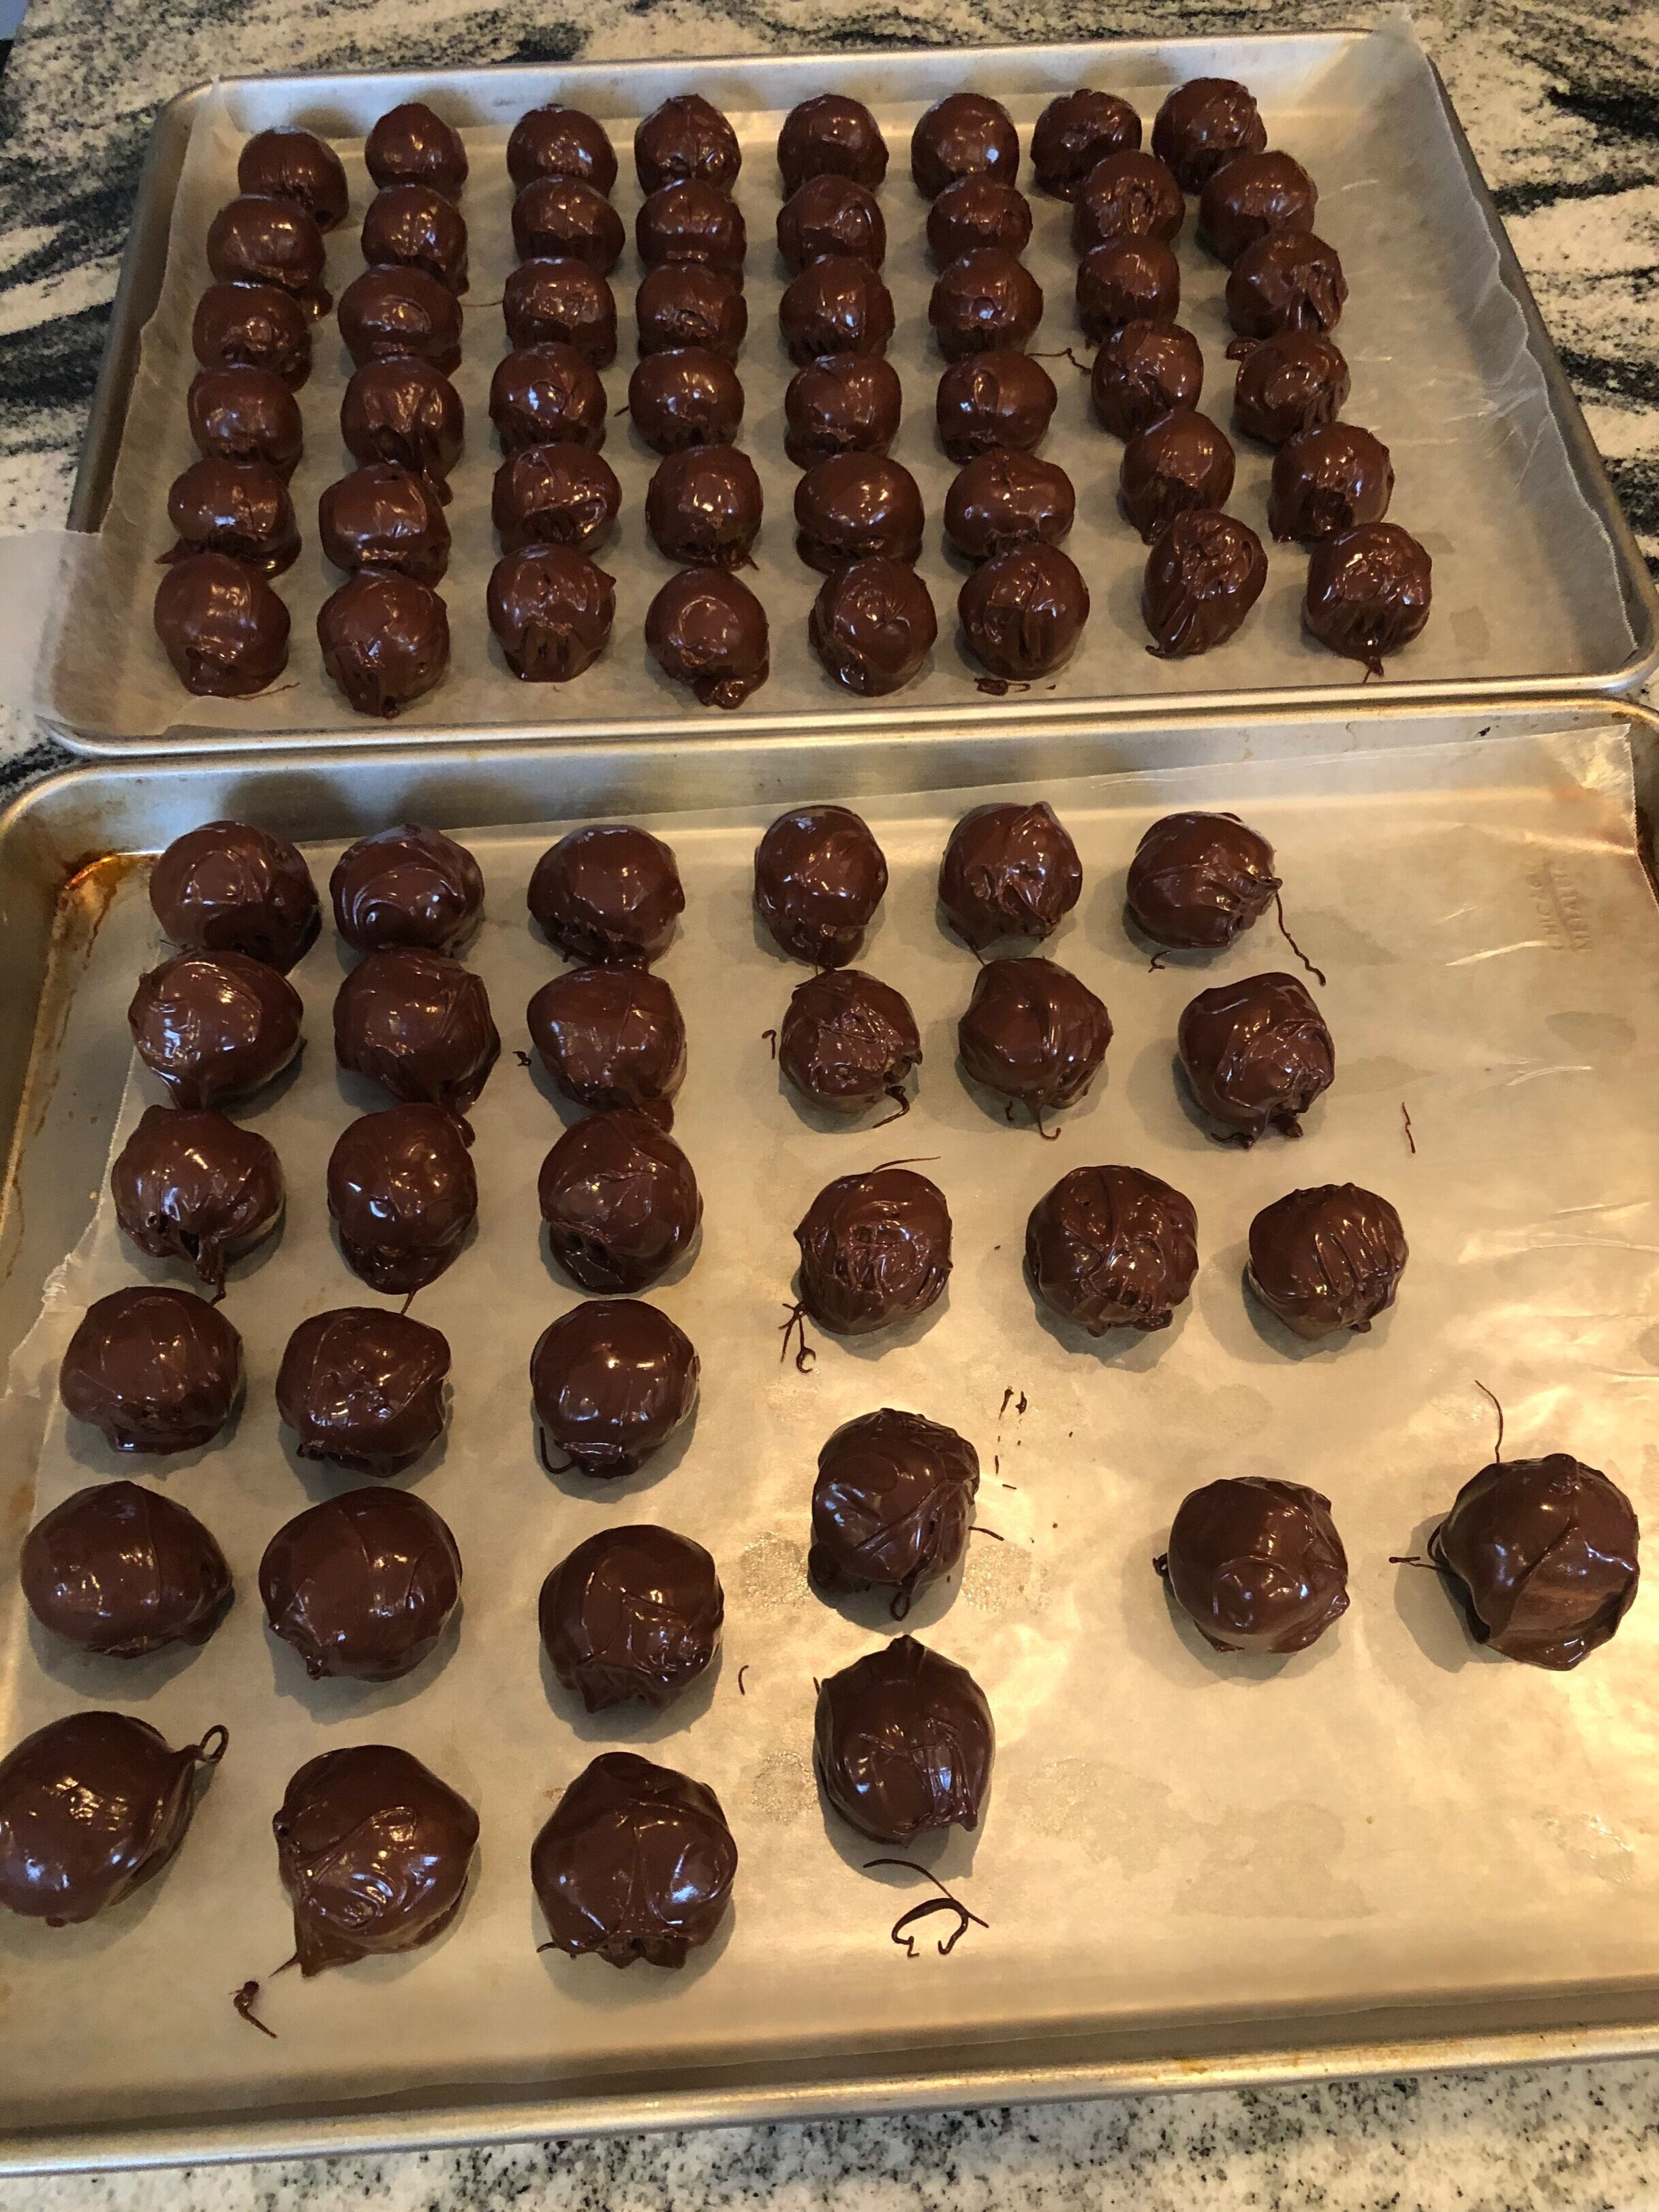 Everyone's favorite - Graham Cracker Delights, aka Peanut Butter Balls!